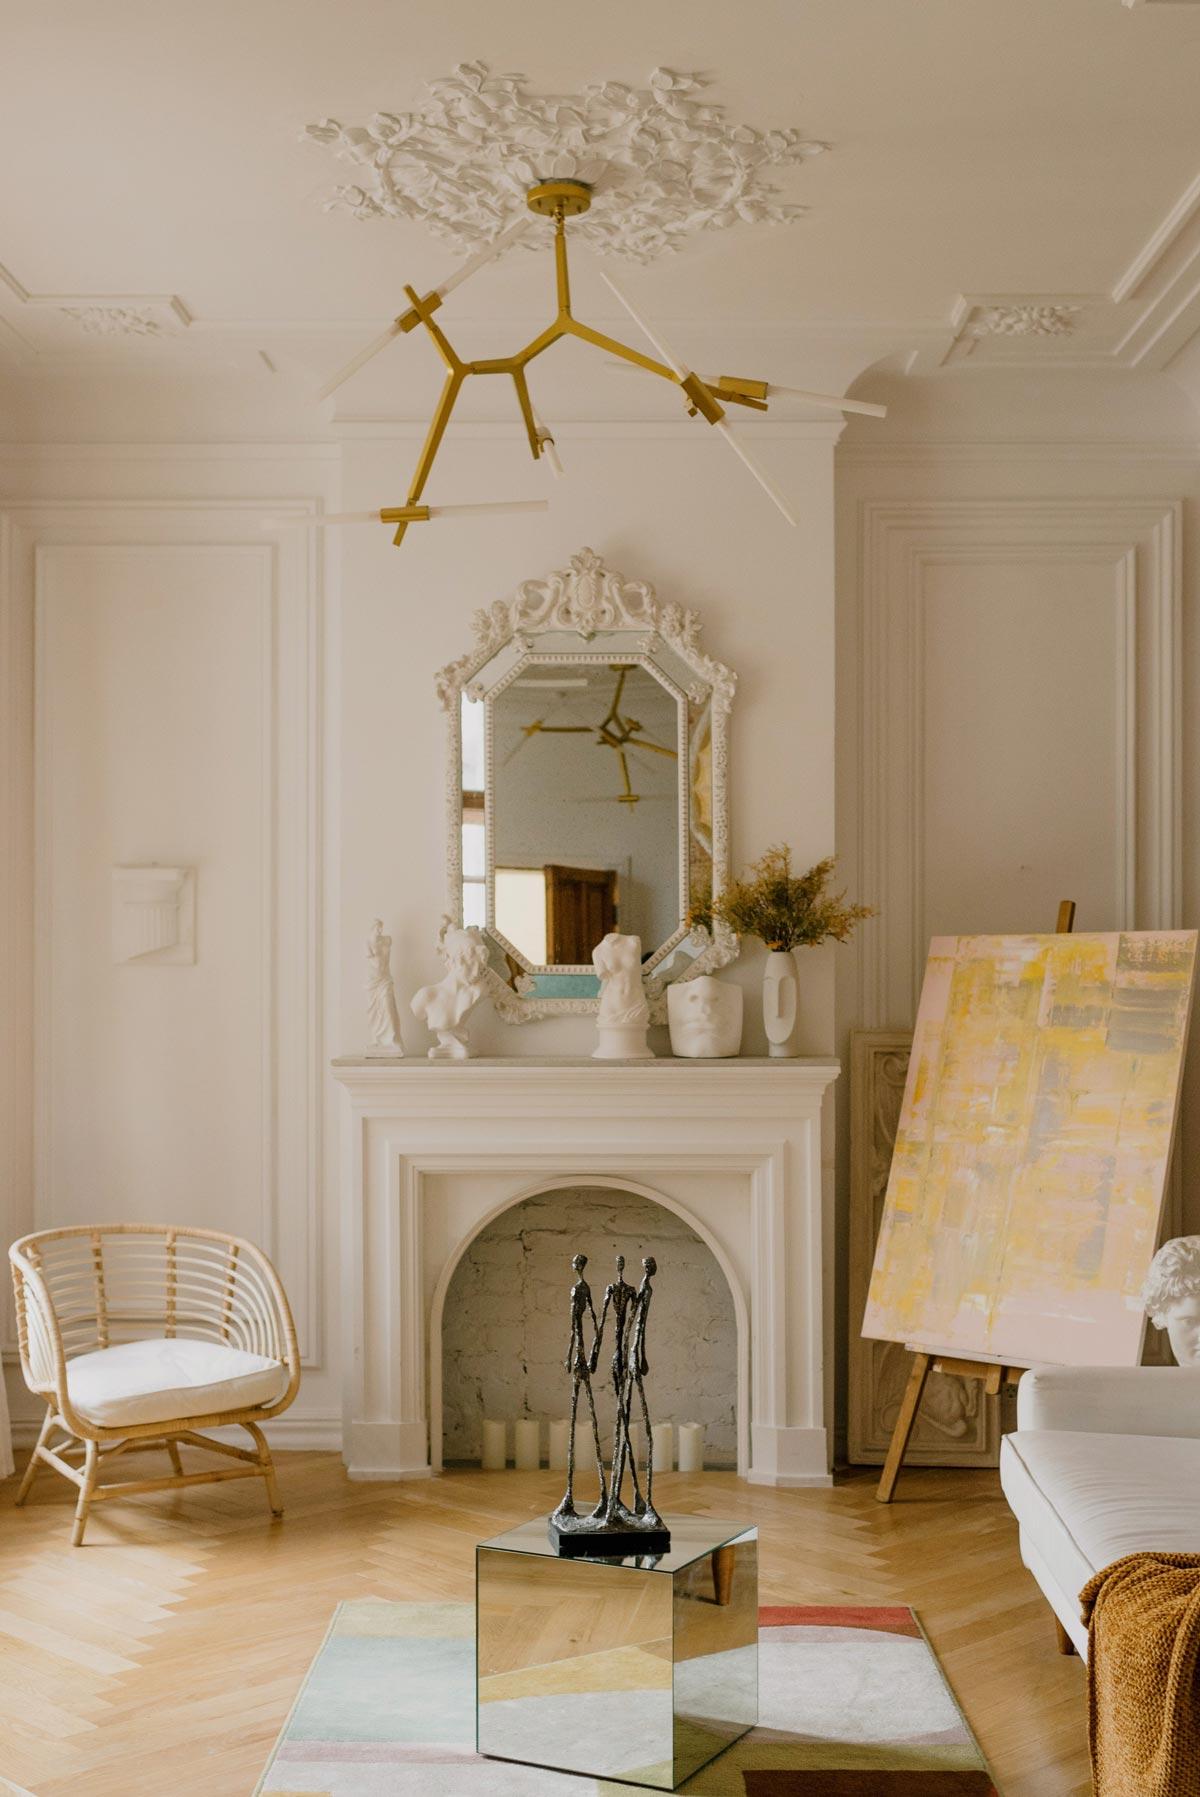 Kris Leuven Interior Designer Branding Photo Style – image by Ksenia Chernaya